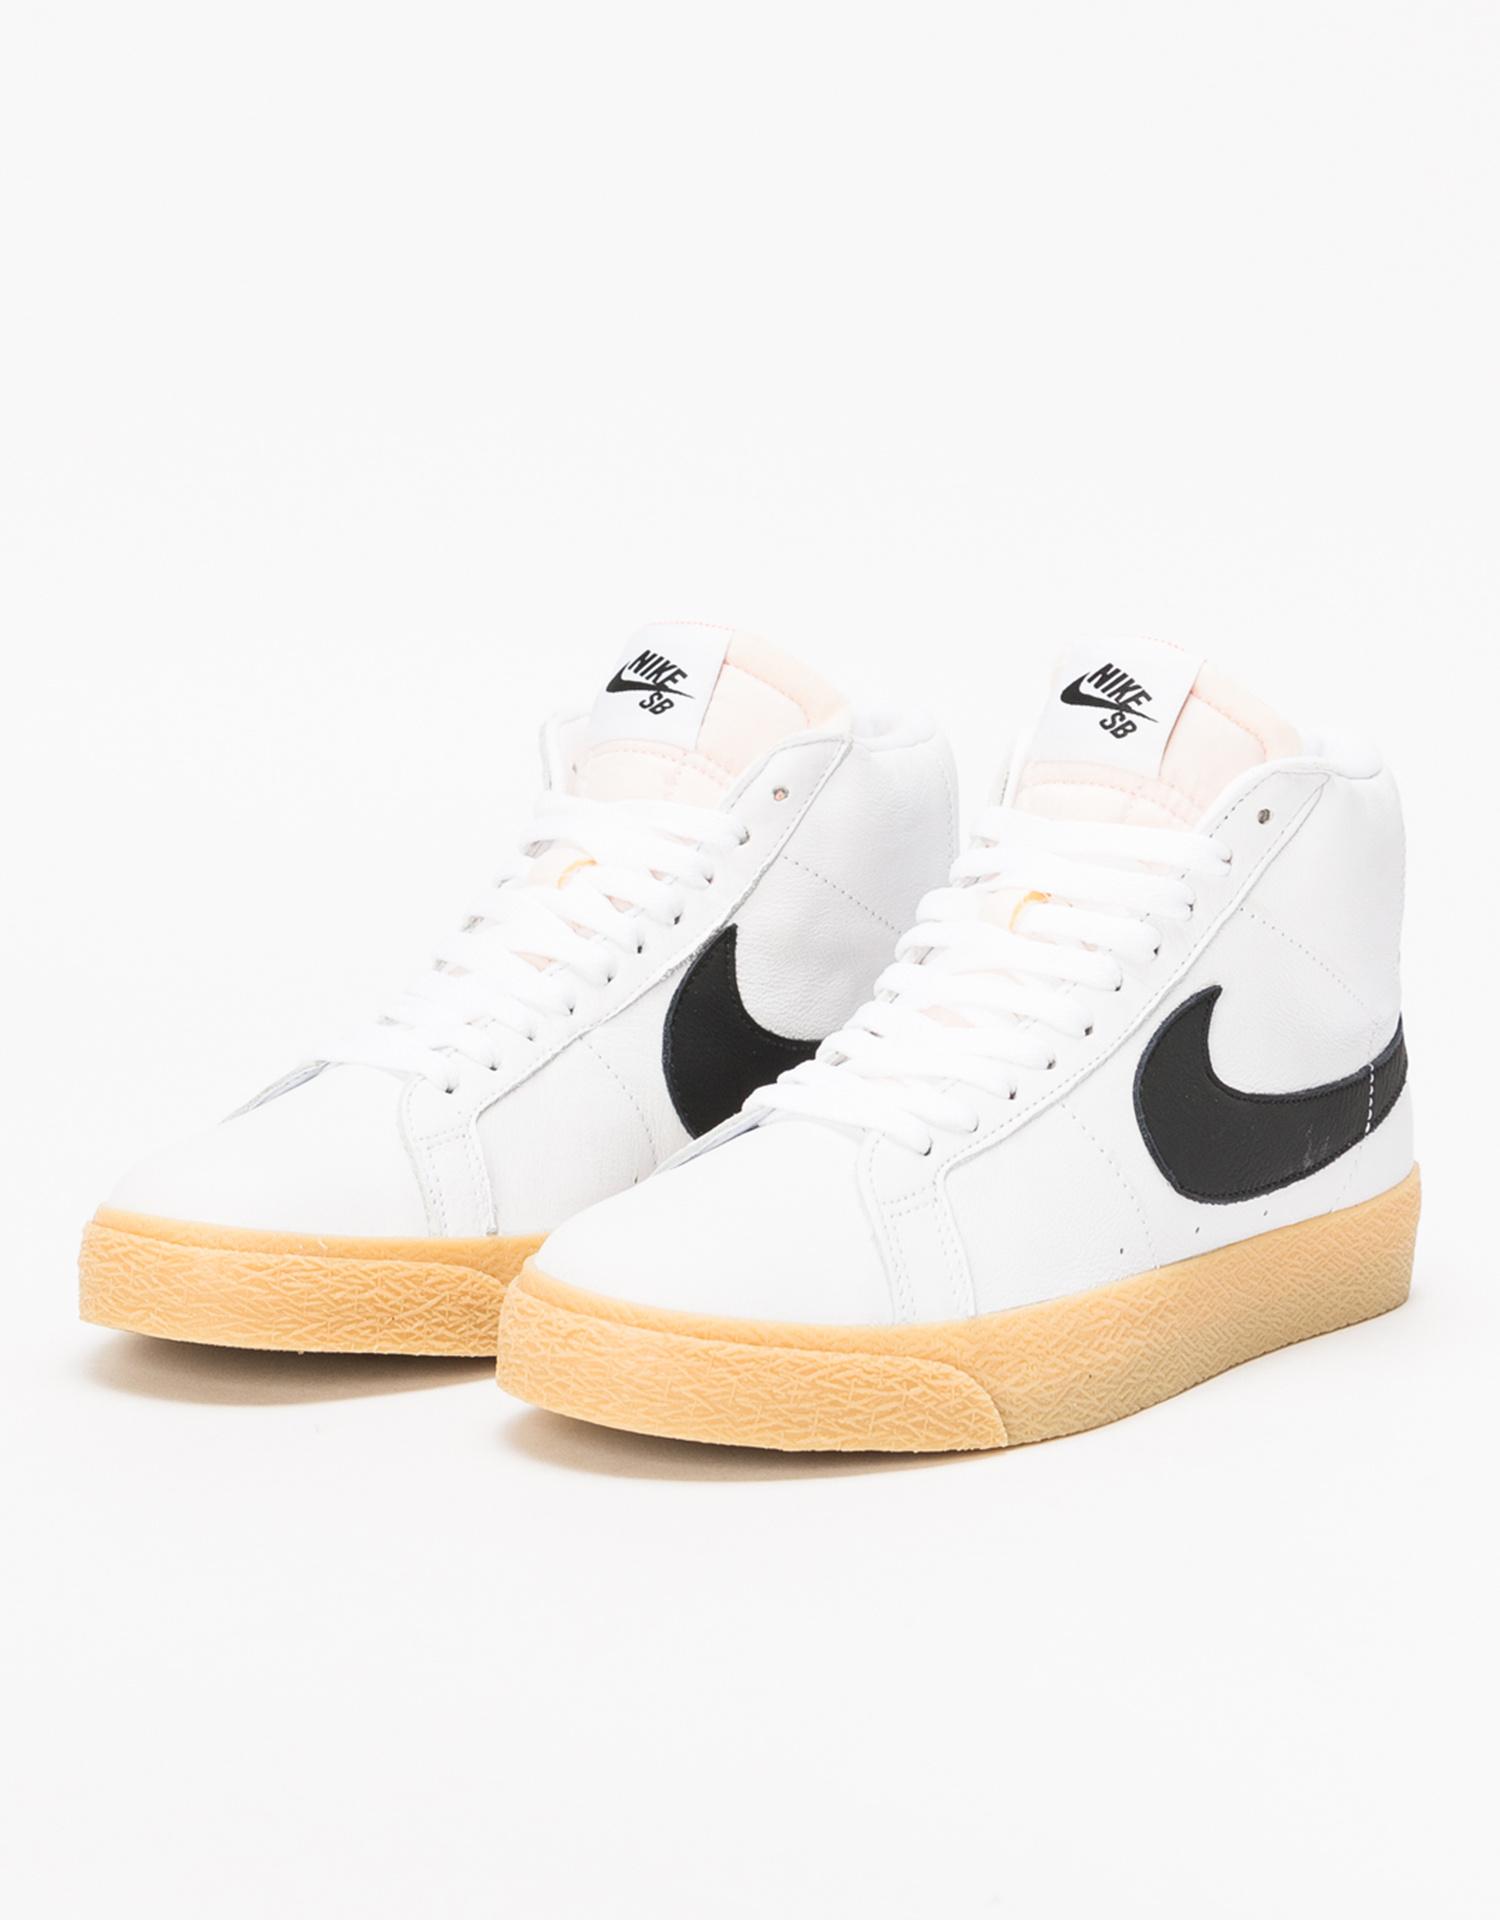 promo code 47d30 a73f4 Nike SB Zoom Blazer Mid ISO Orange Label white black-safety orange -  Lockwood Skateshop